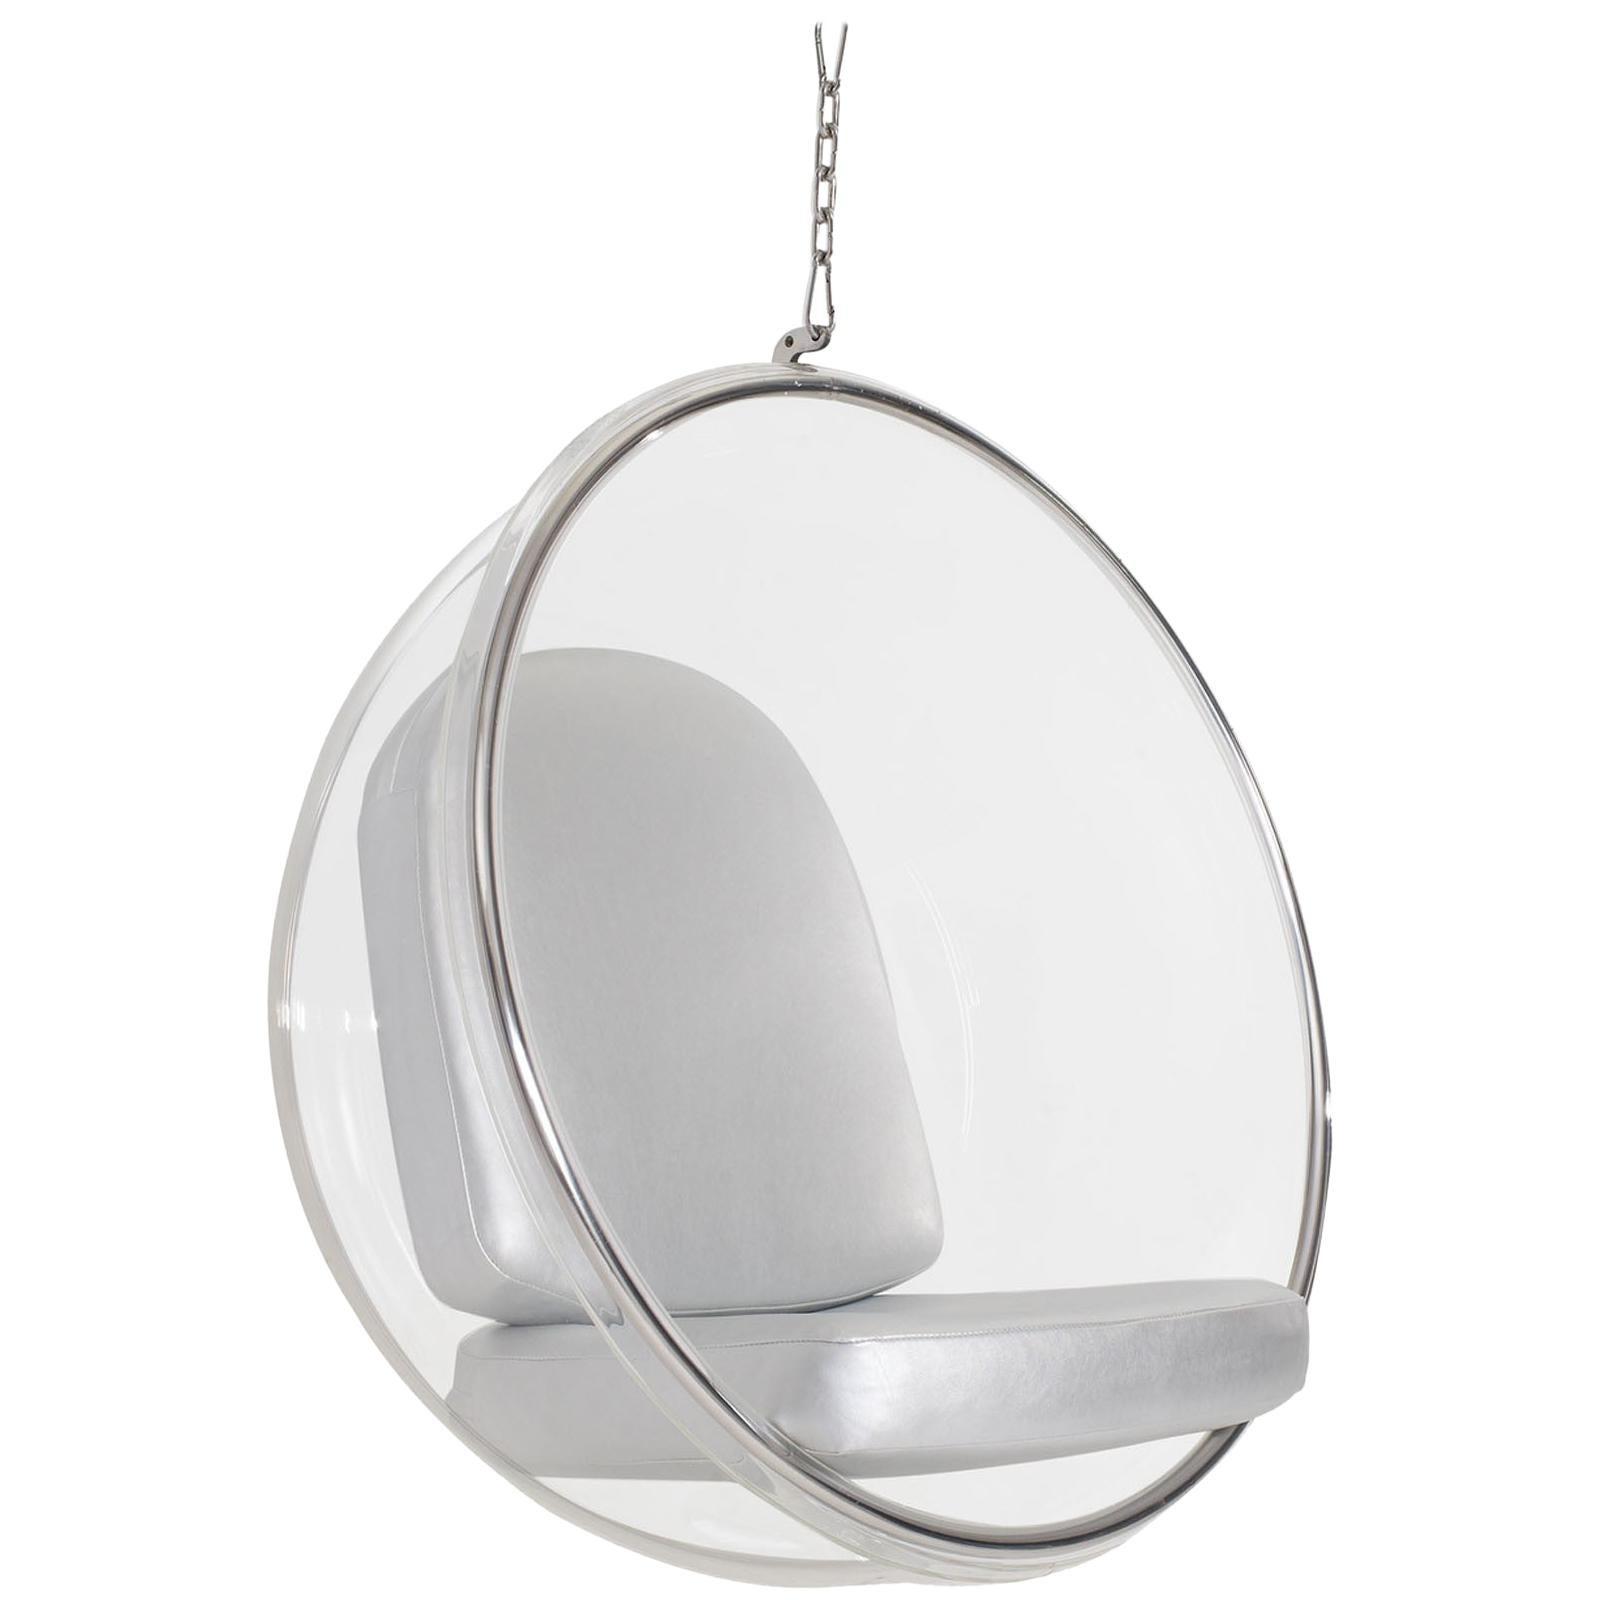 Iconic Eero Aarnio Silver Bubble Chair